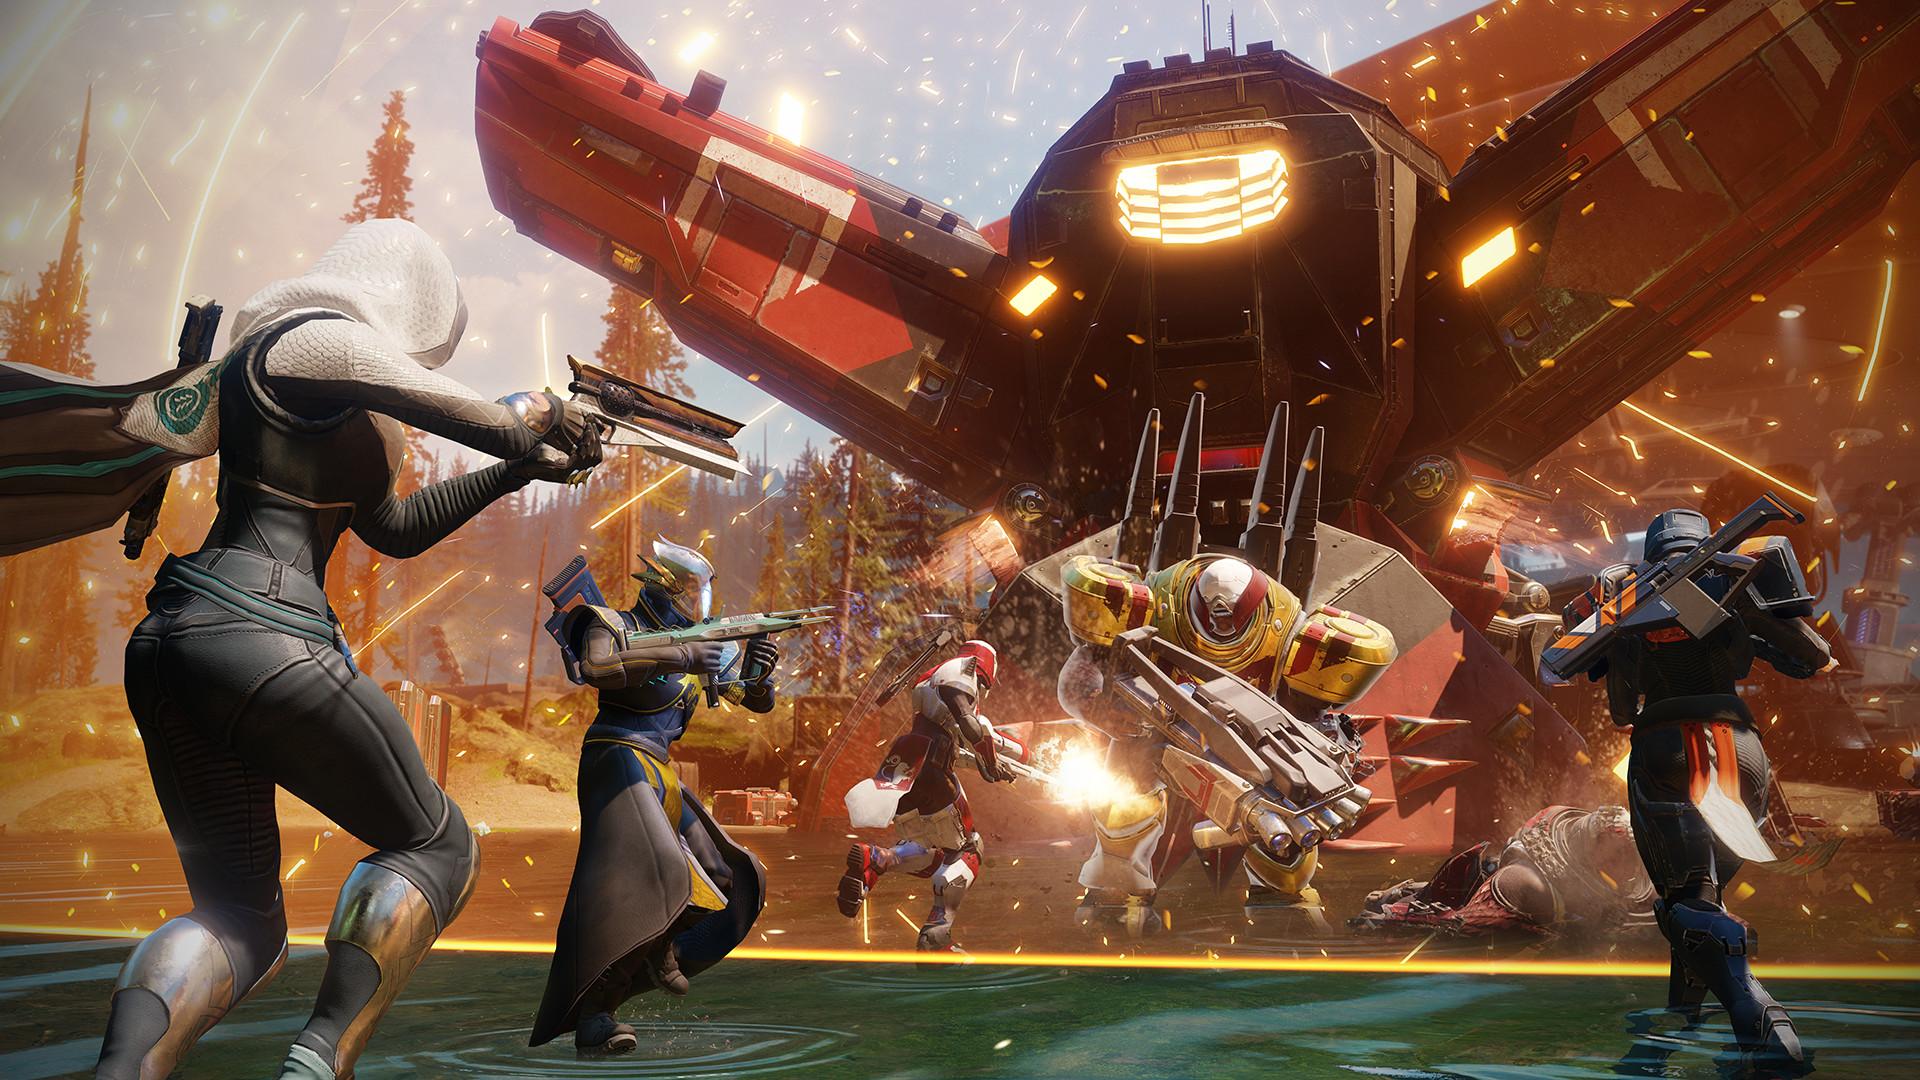 The best games like Diablo: Destiny 2